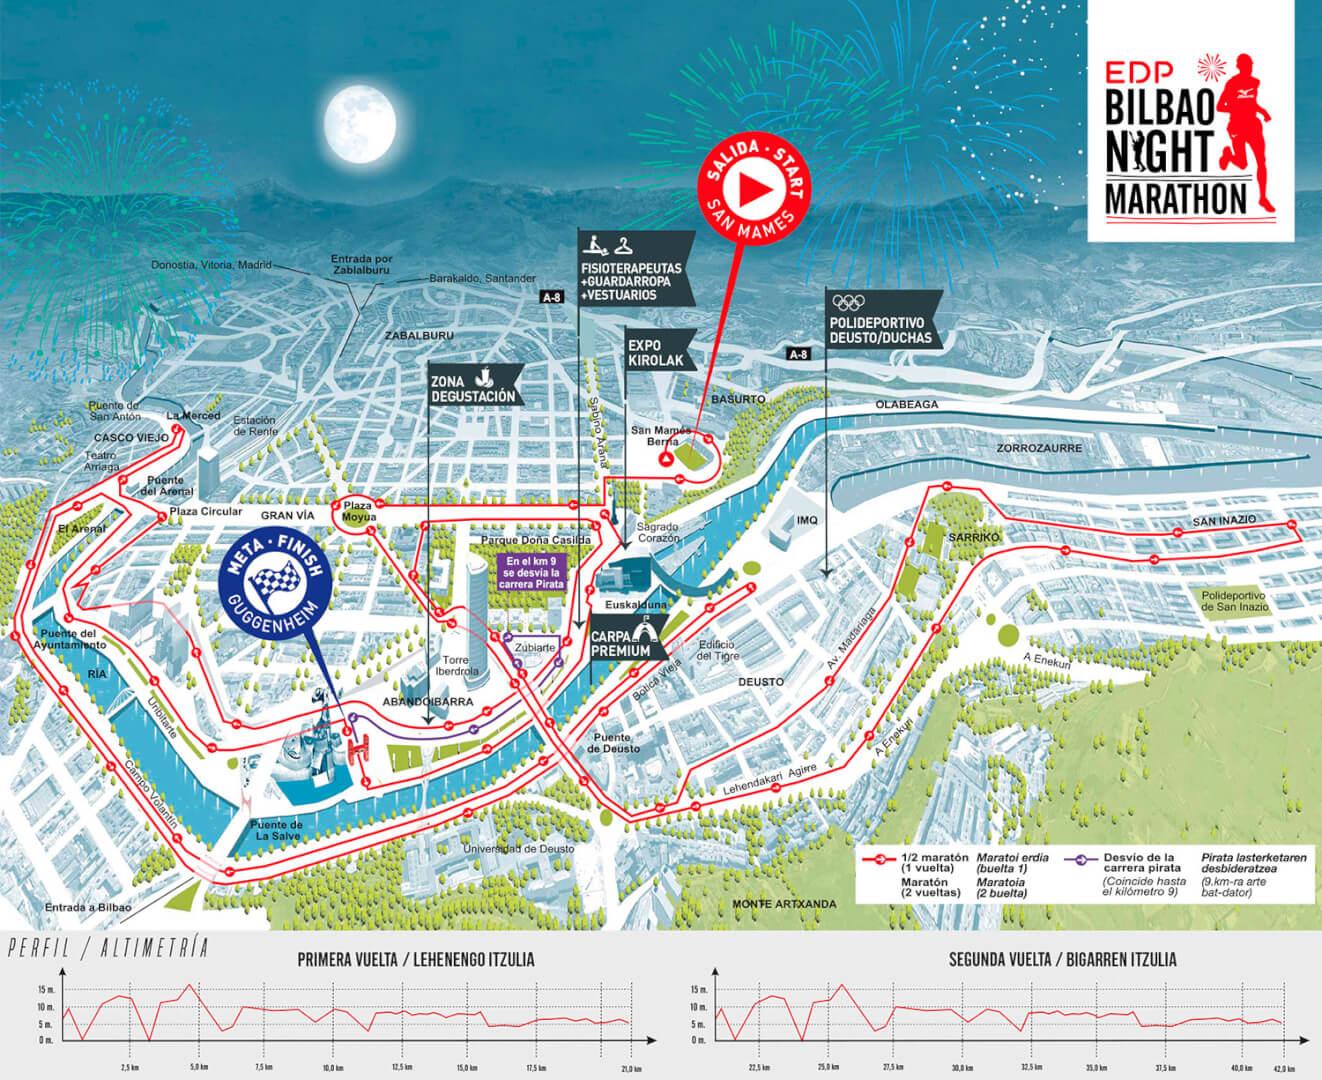 Bilbao Plano Night Marathon